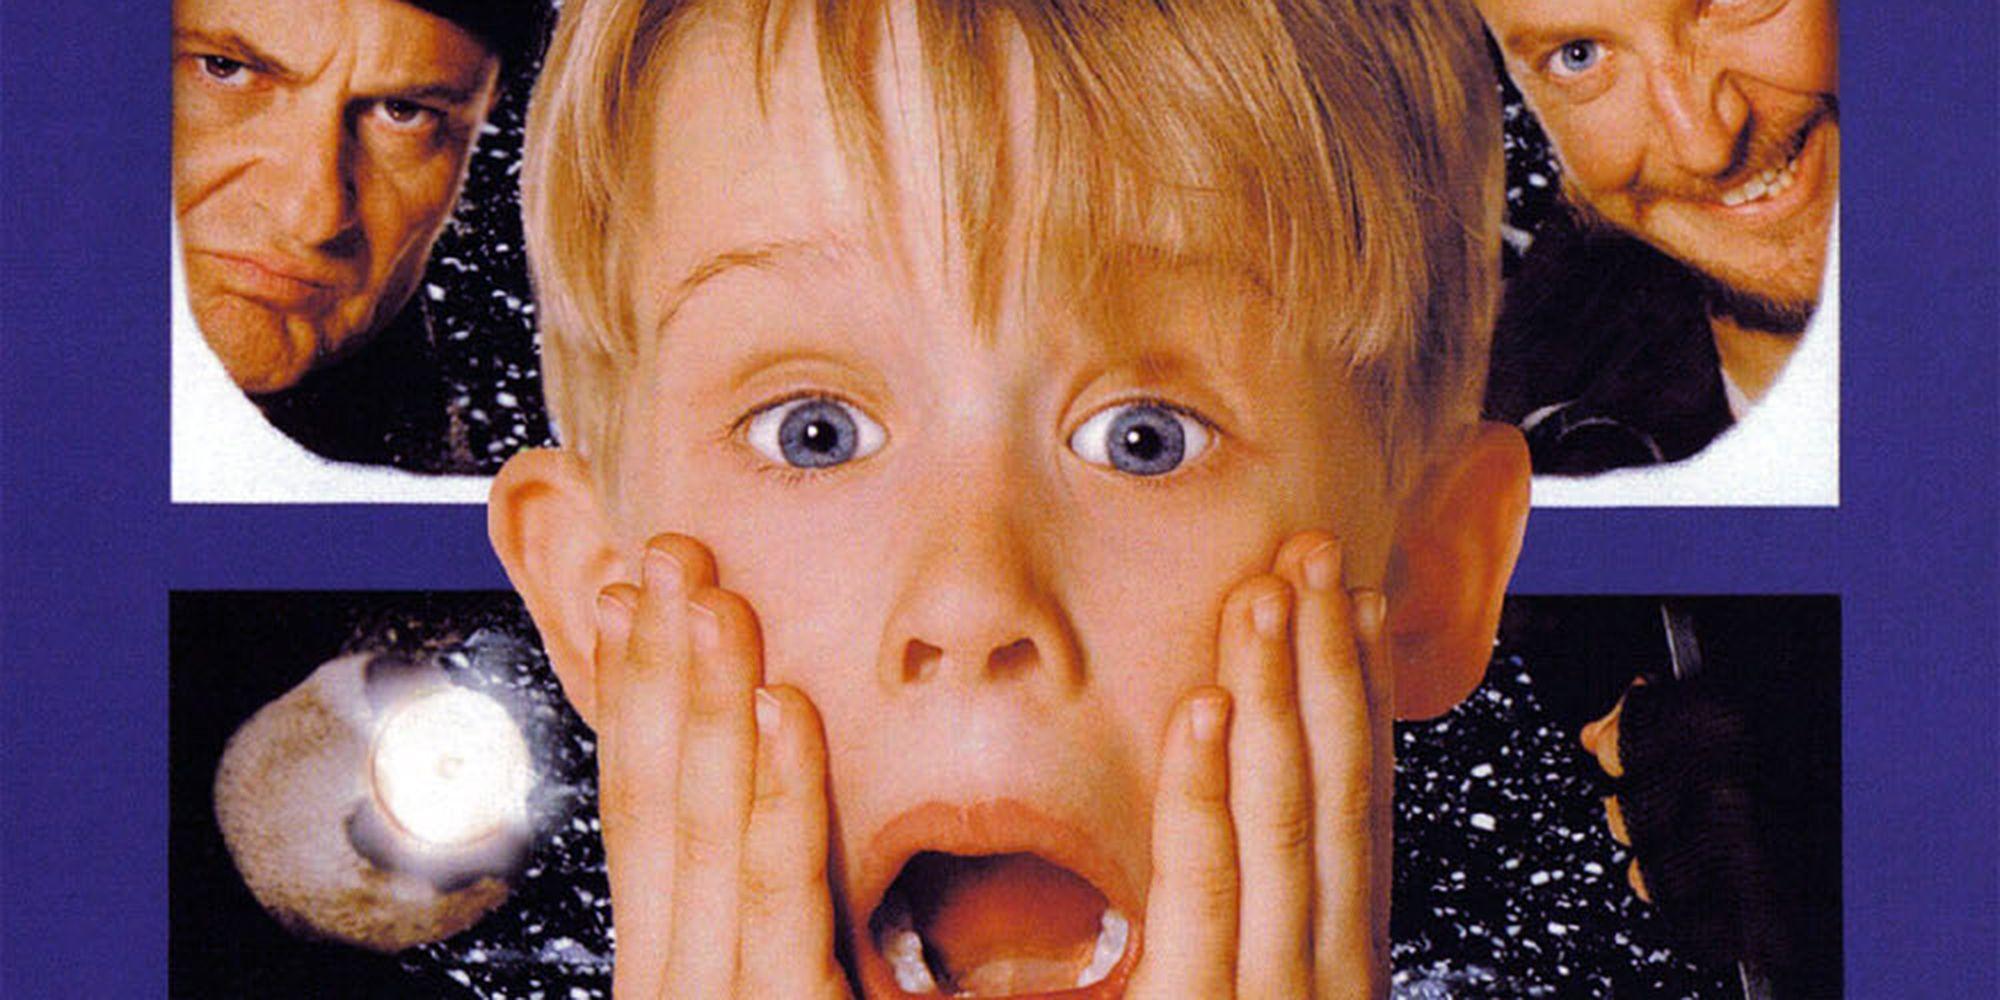 Macaulay Culkin's Home Alone Update Is Pretty Depressing   CBR